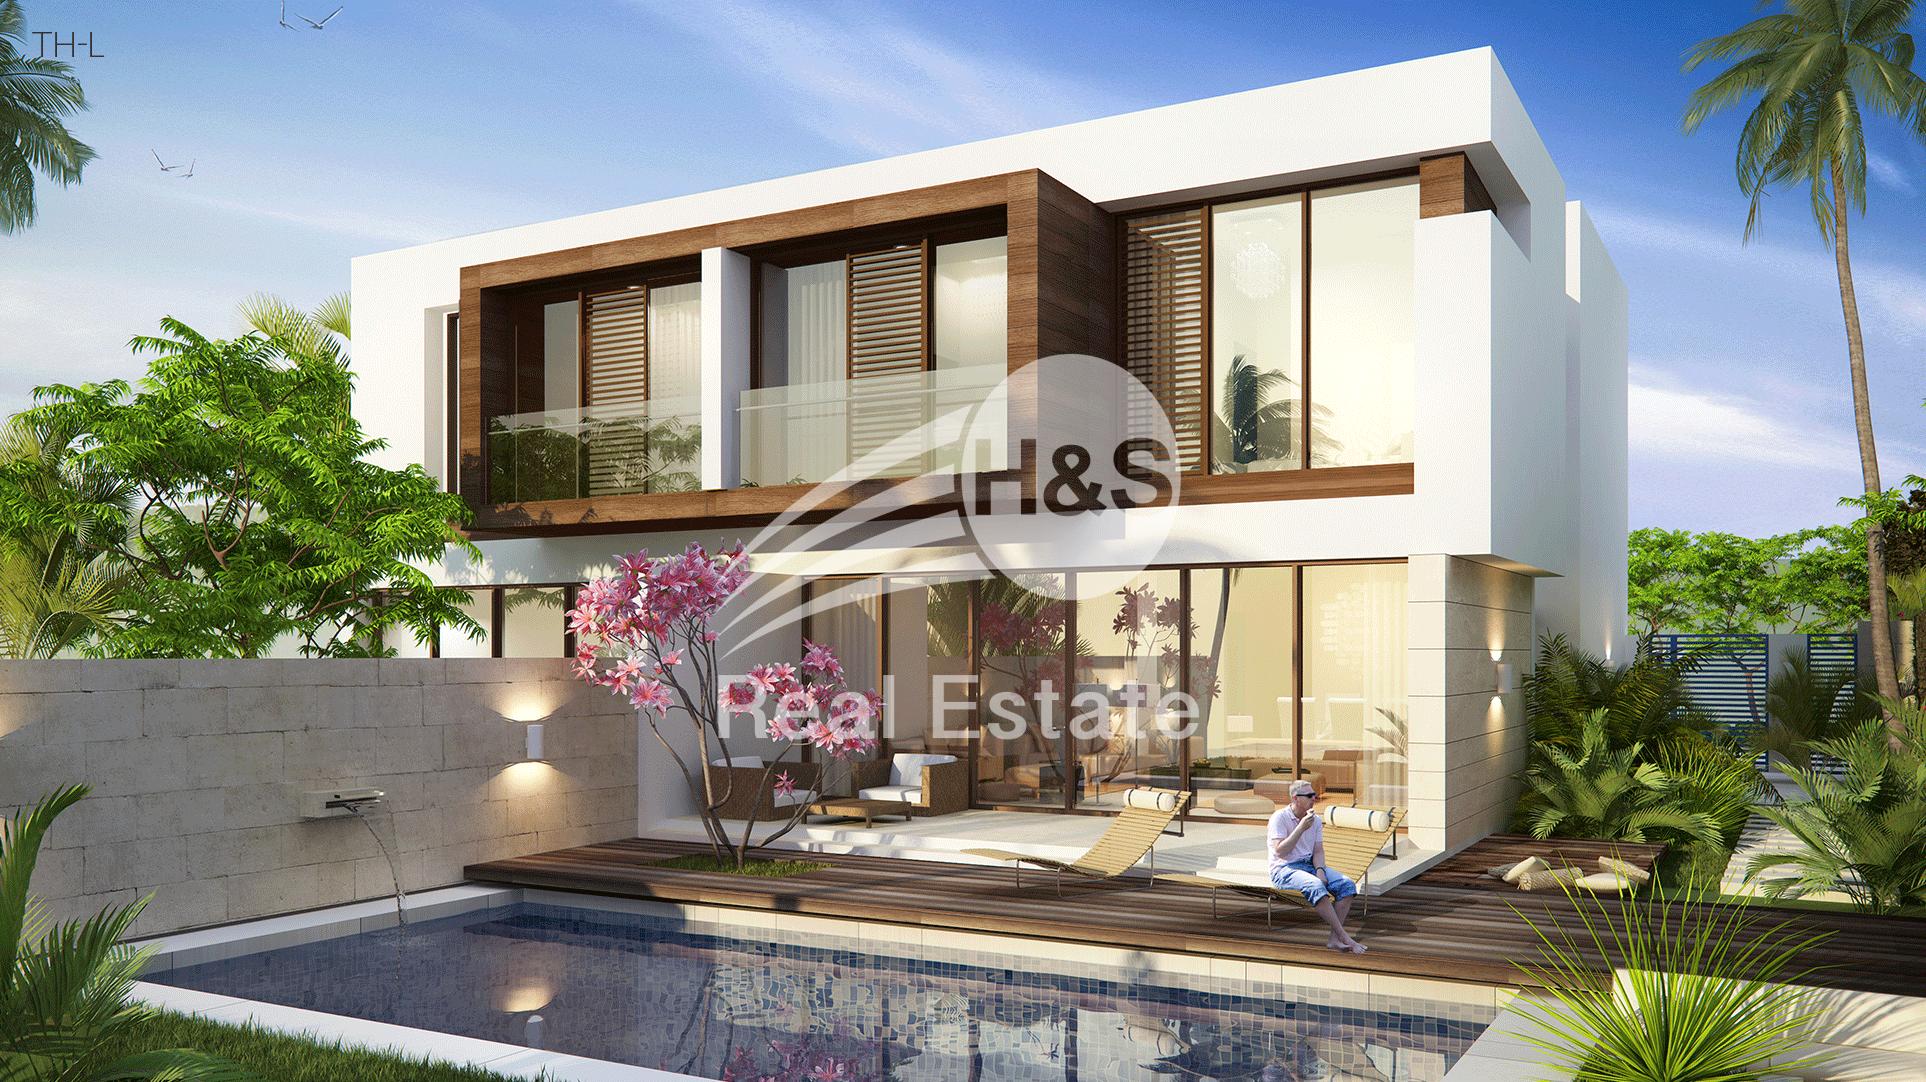 Limited Offer I Modern Design Townhouses-THL